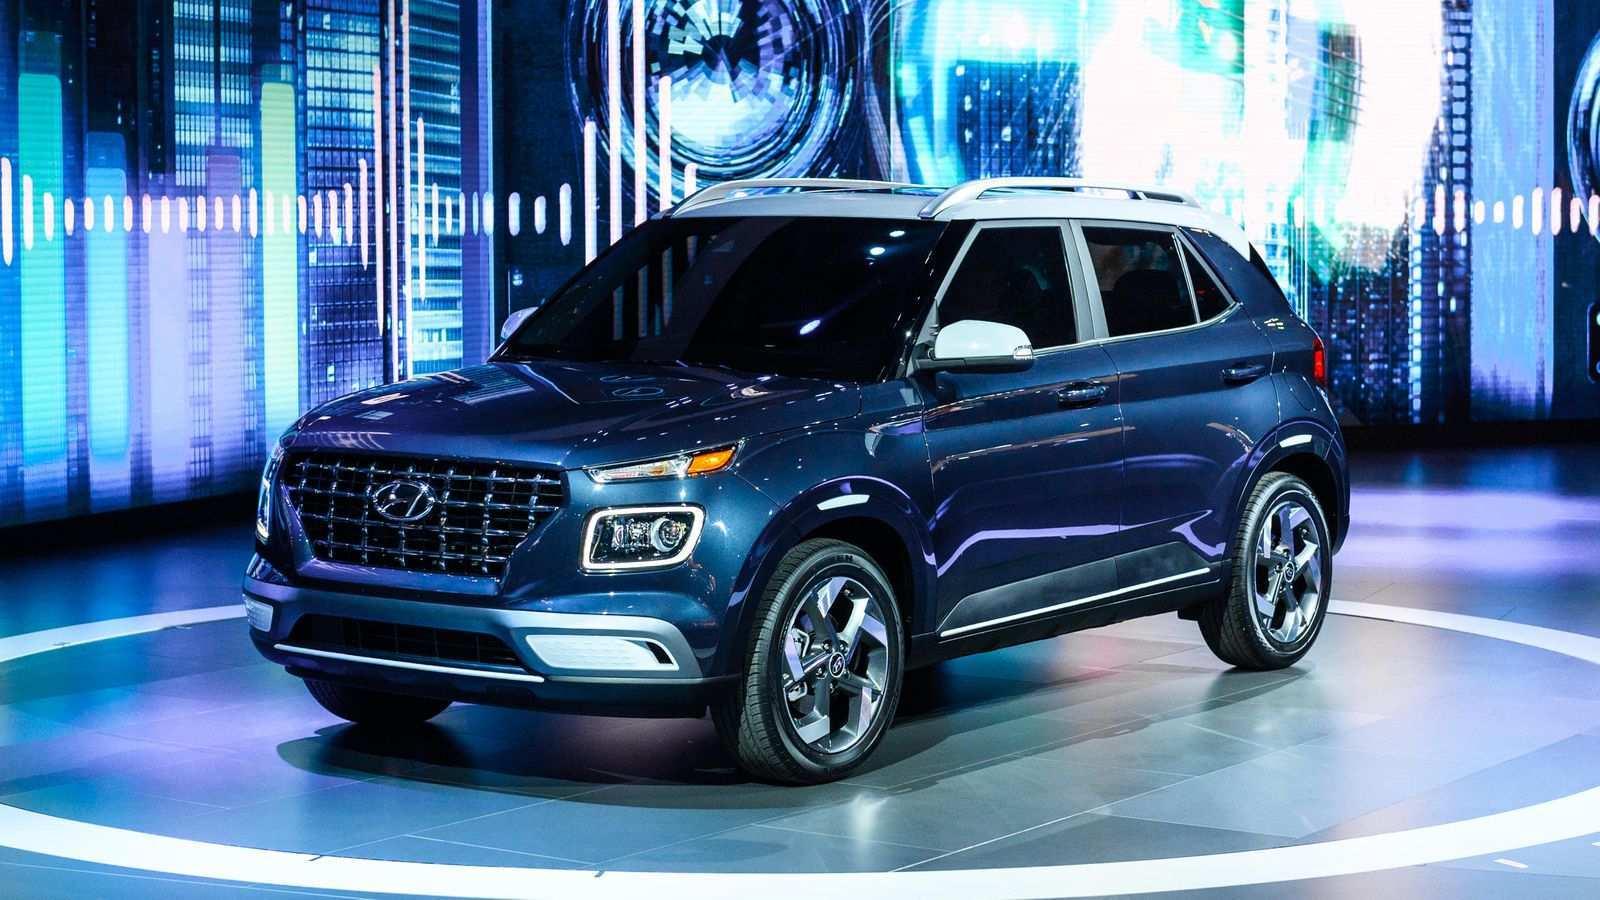 58 Concept of Hyundai Lineup 2020 Overview for Hyundai Lineup 2020